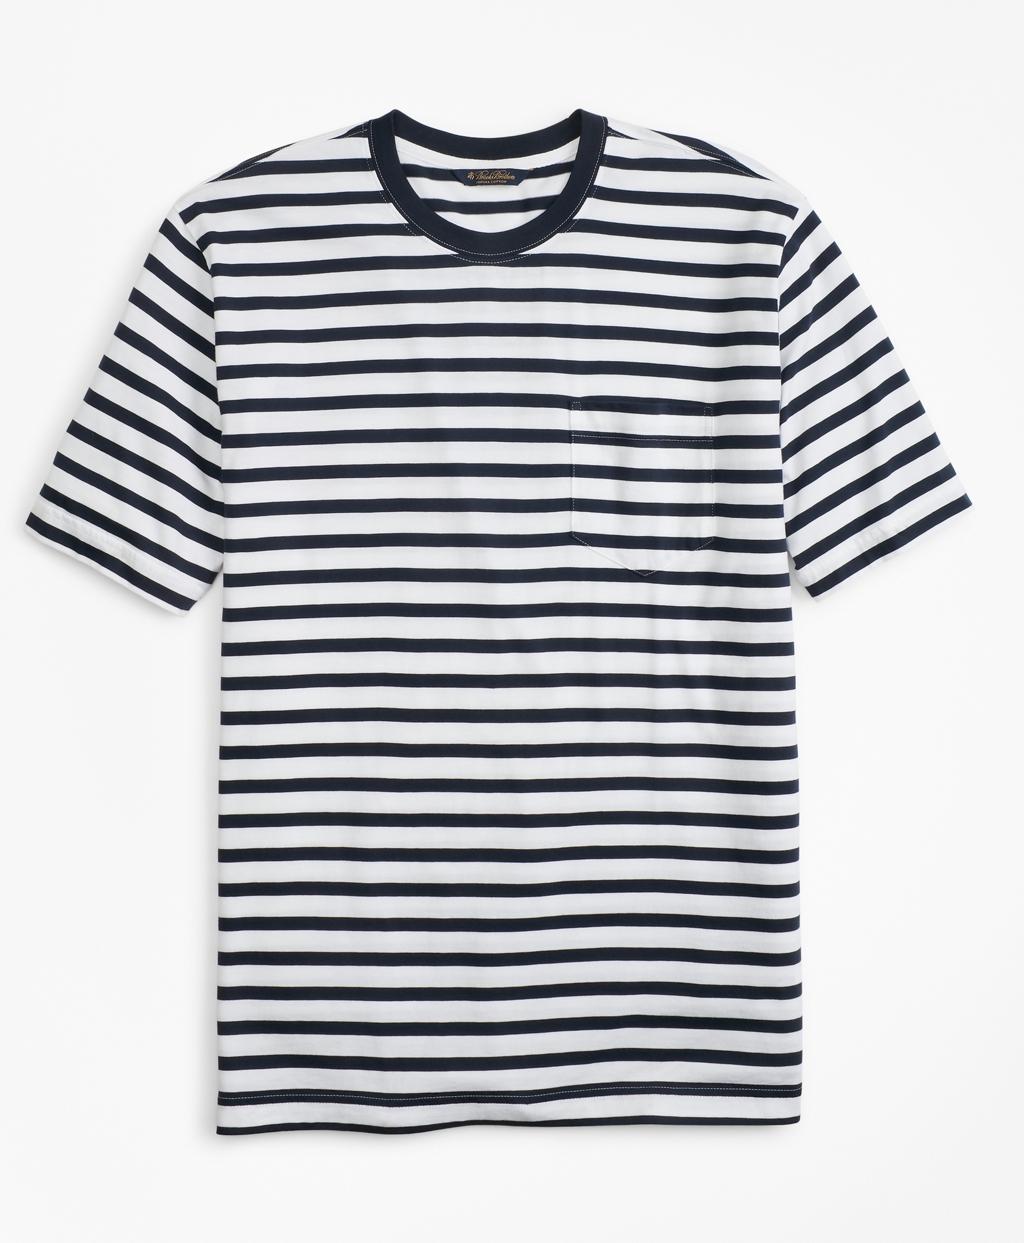 1940s Style Mens Shirts, Sweaters, Vests Brooks Brothers Mens Supima Cotton Stripe T-Shirt $49.50 AT vintagedancer.com